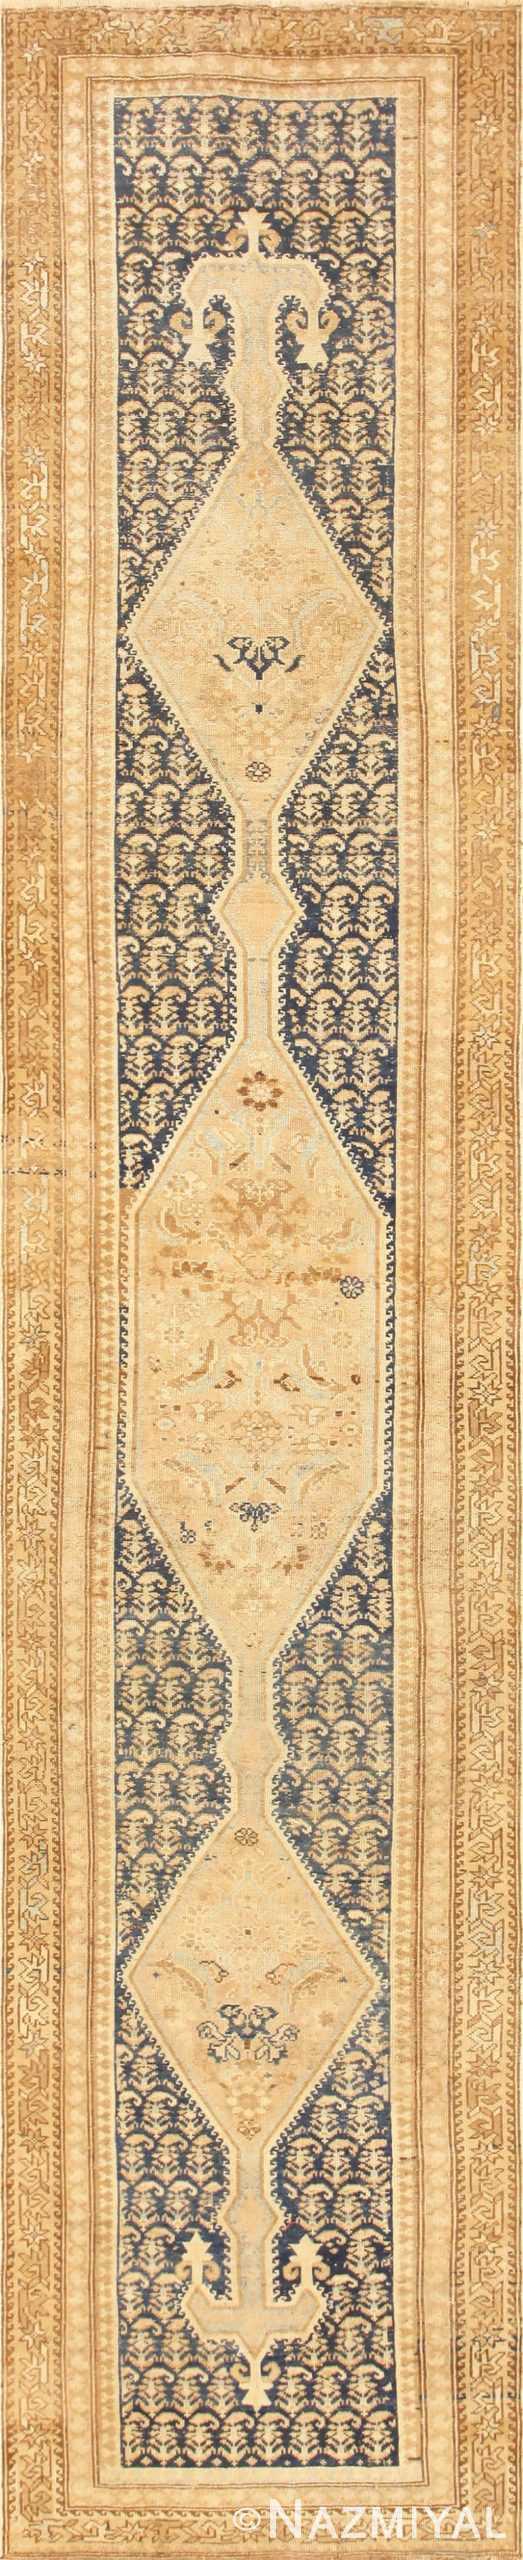 Antique Tribal Persian Malayer Runner Rug 50410 Nazmiyal